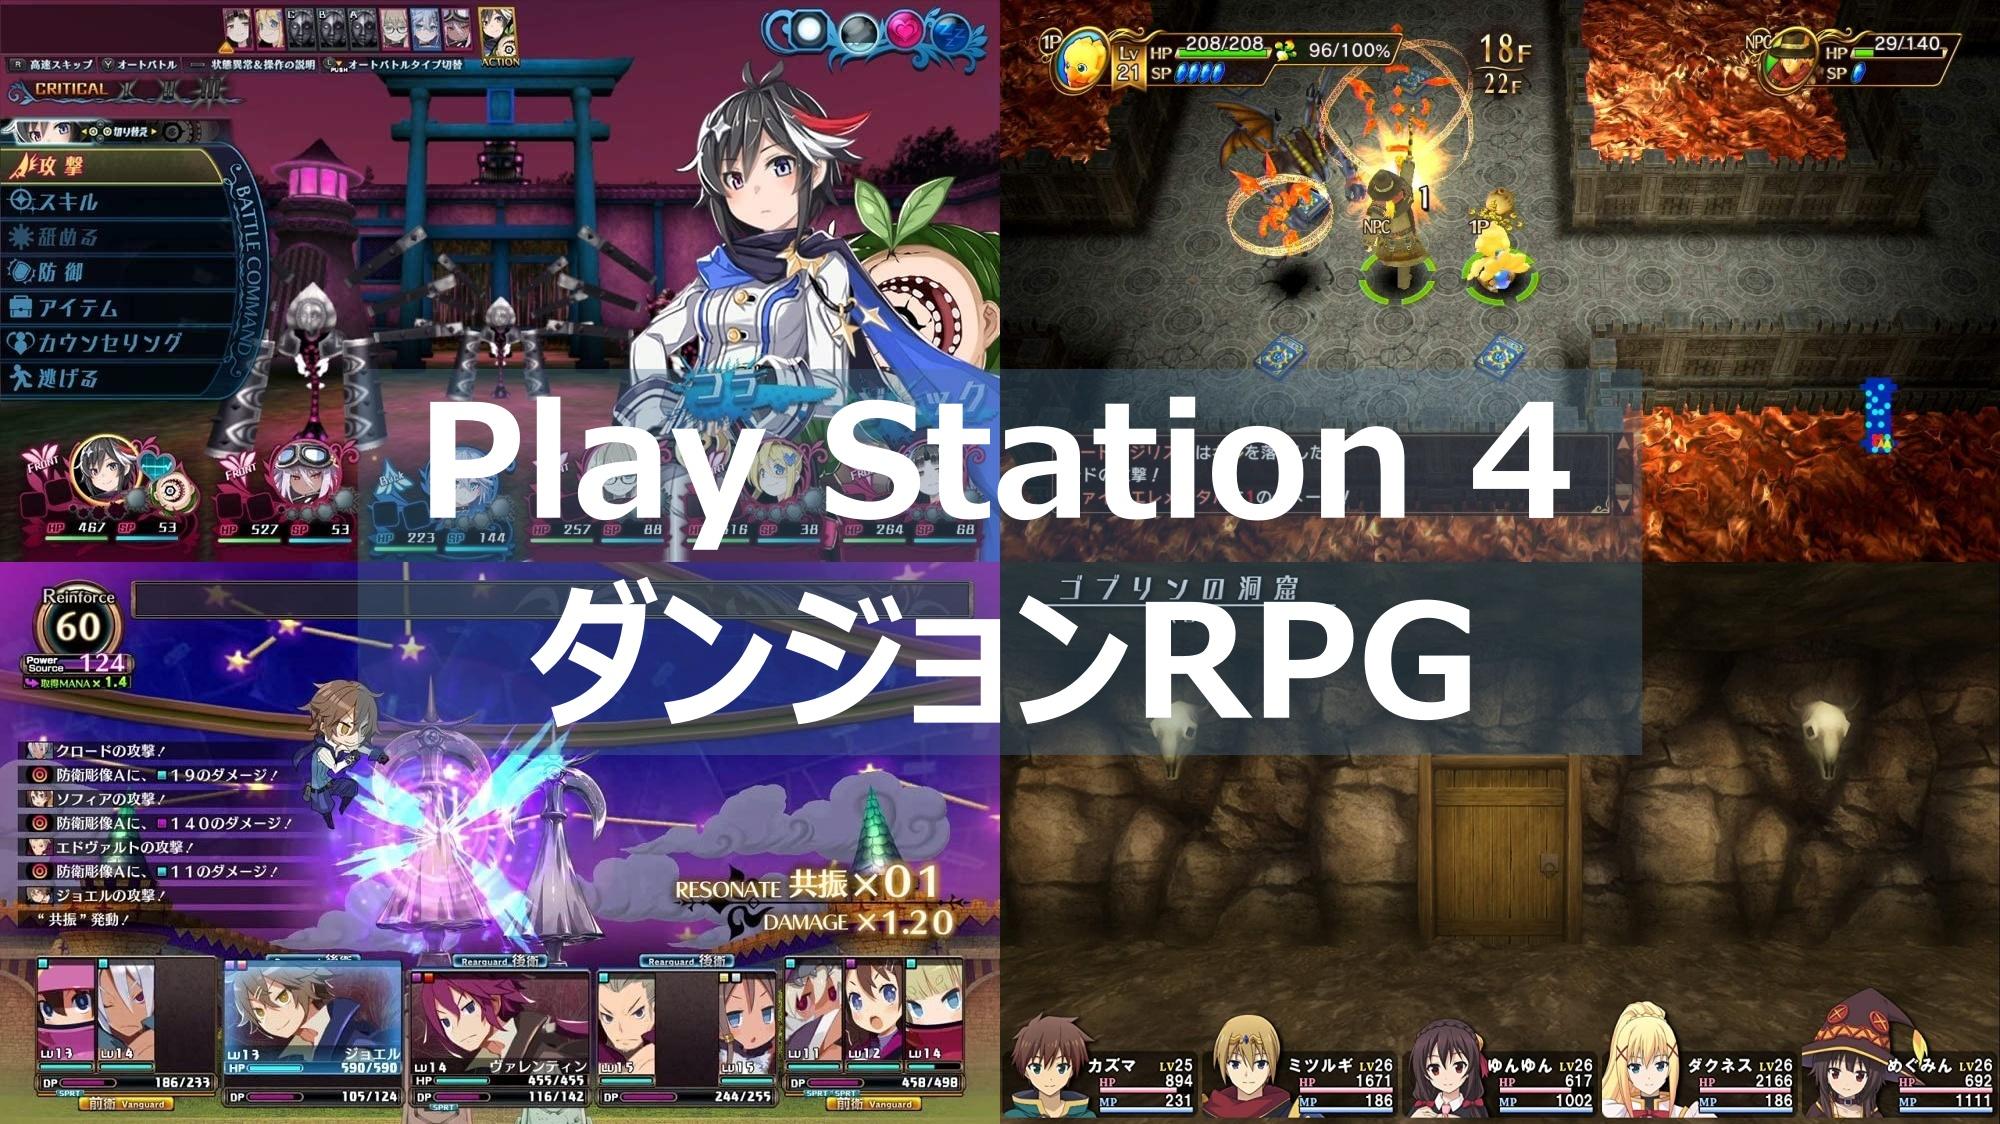 PS4 ダンジョンRPG